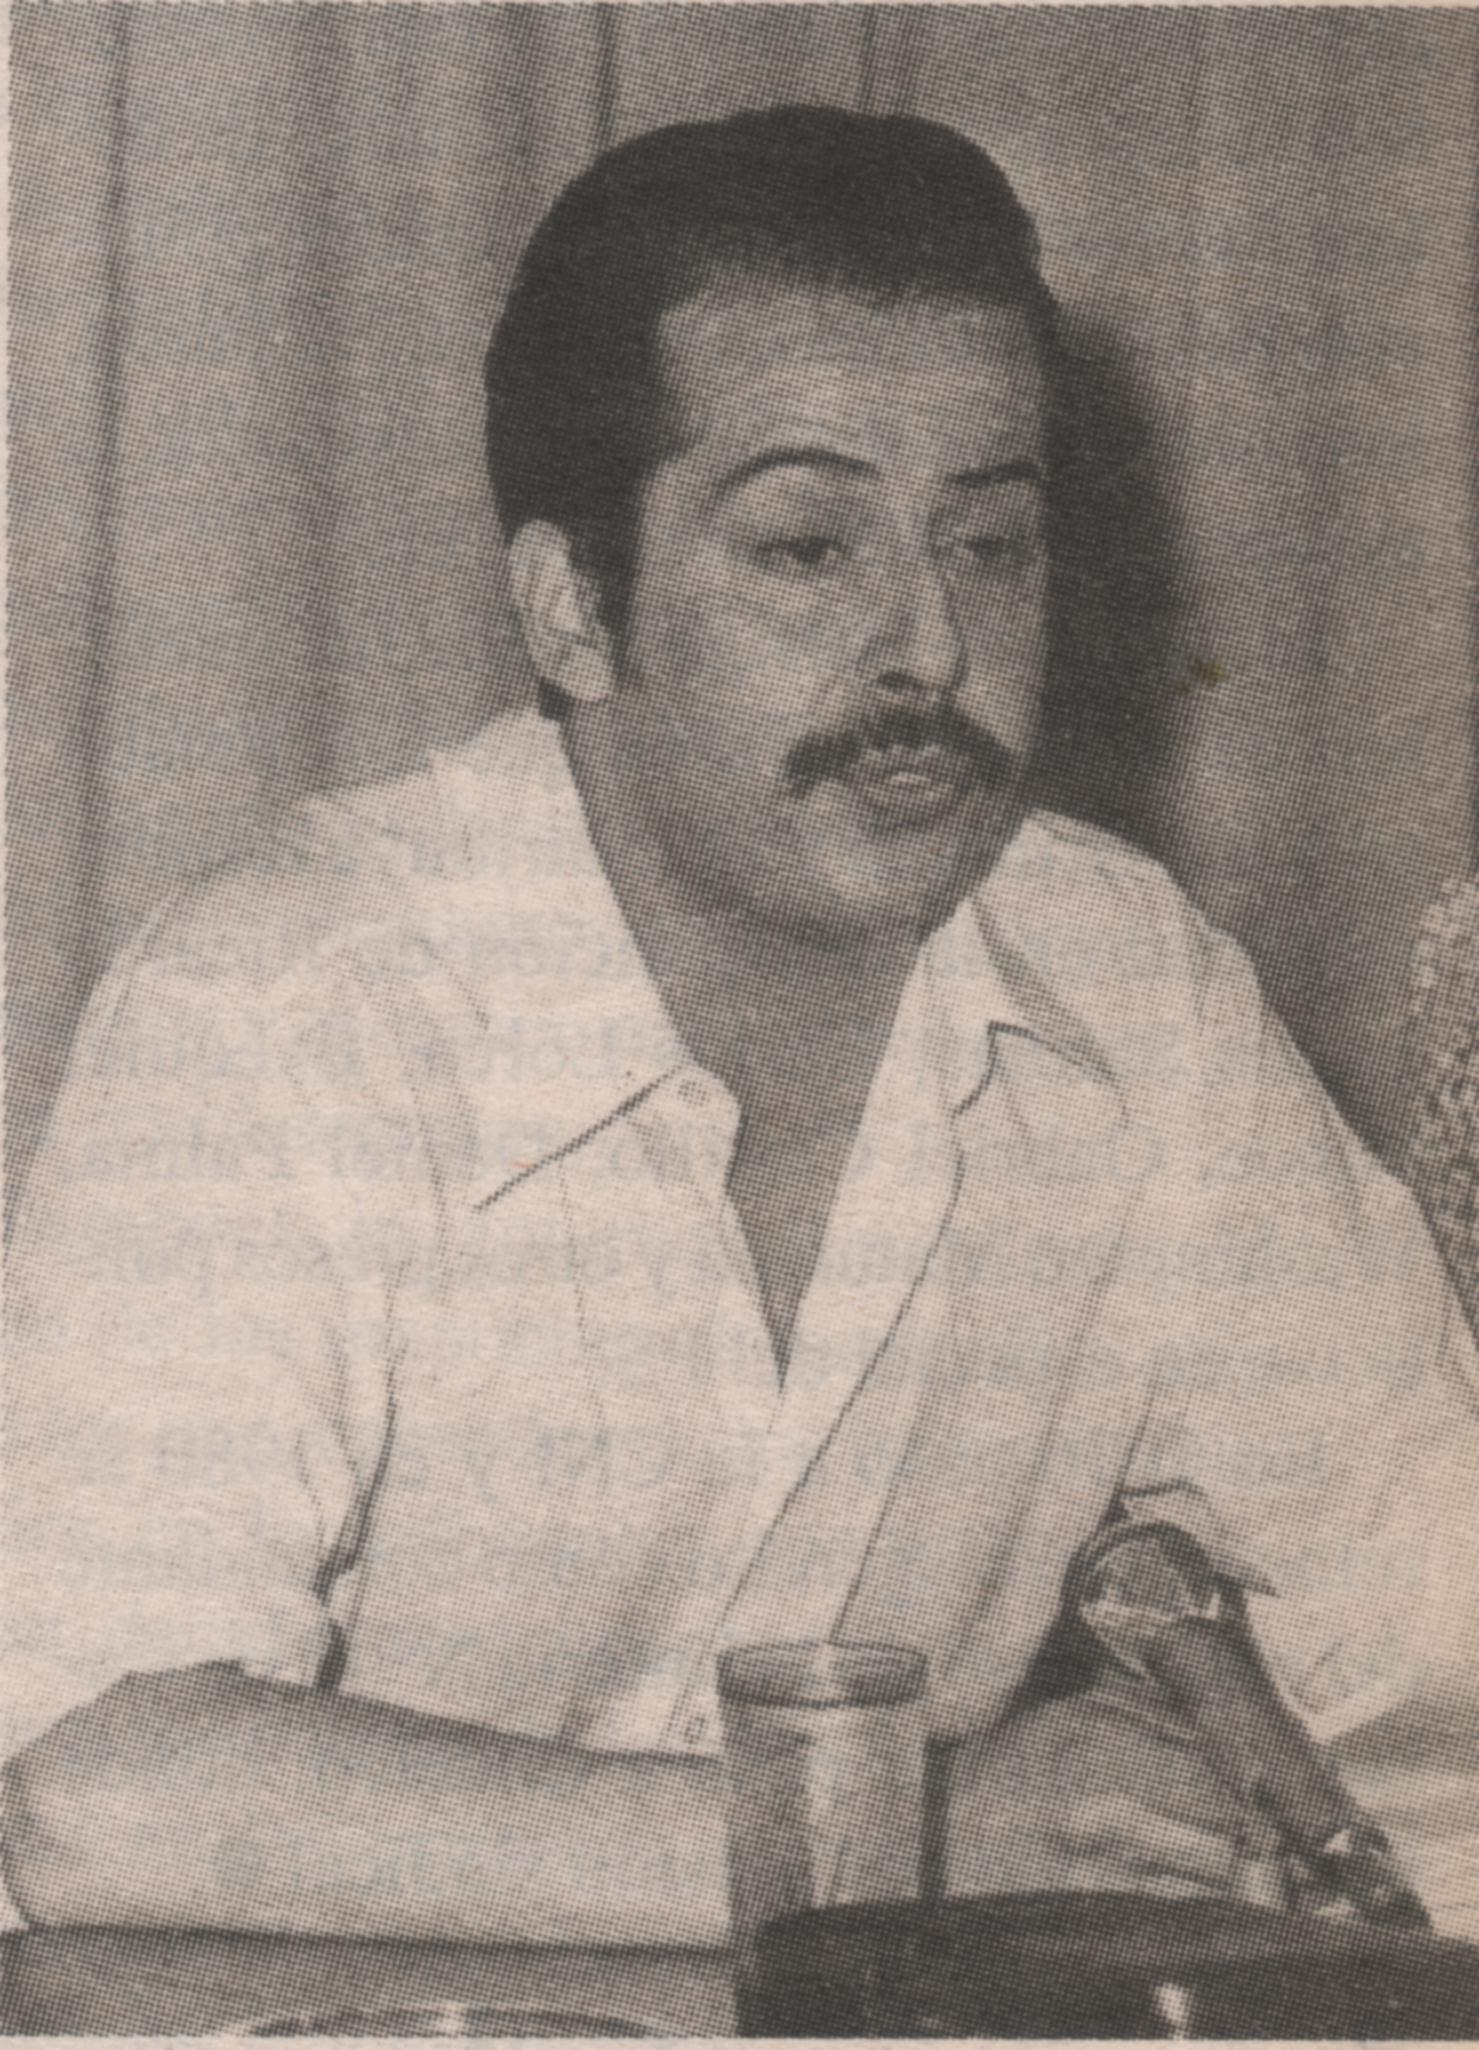 Edgardo Enríquez.